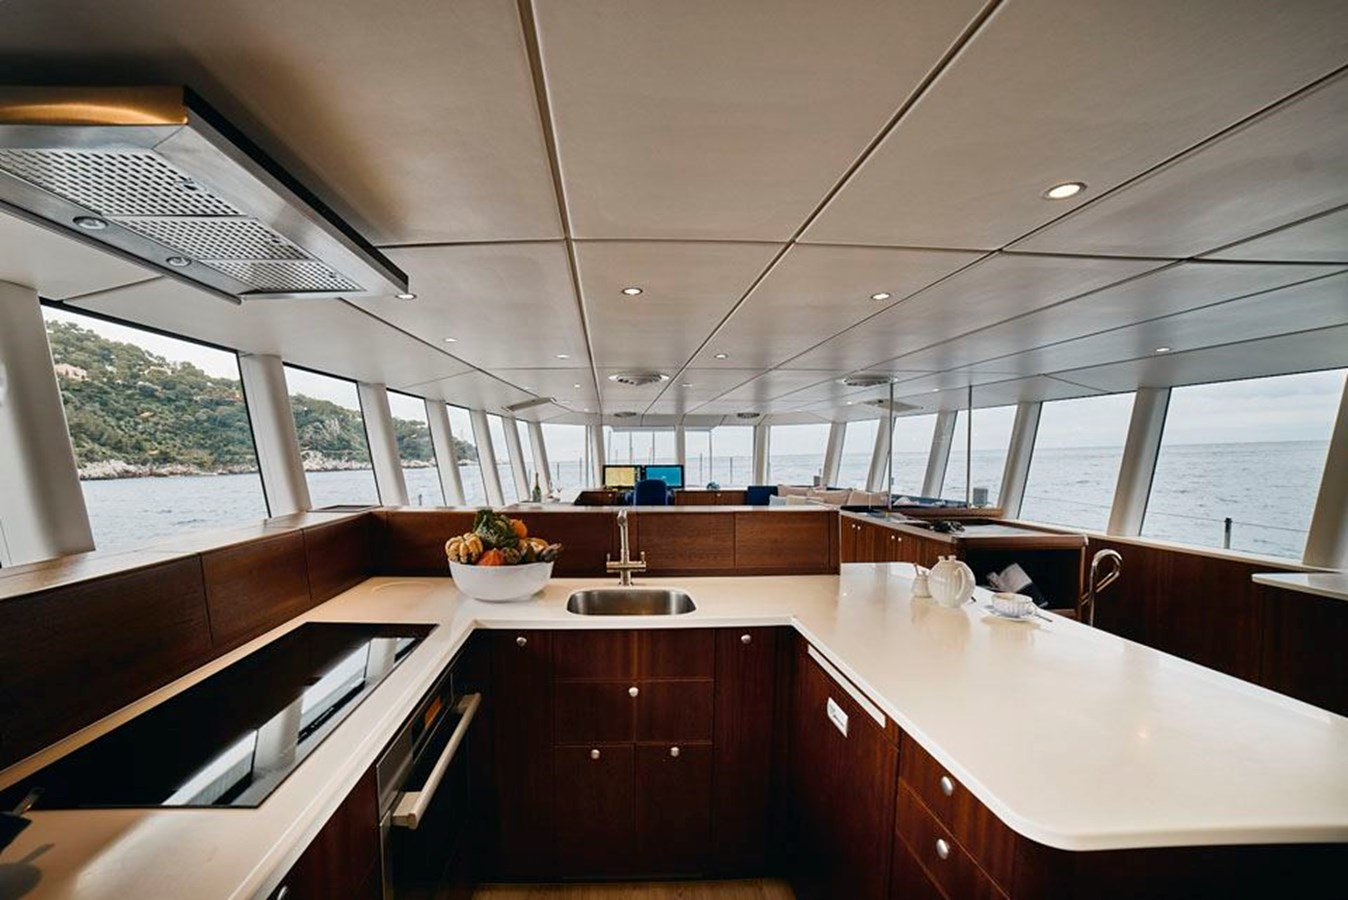 fpb-97-8 2014 CIRCA MARINE FPB 97 Motor Yacht 2788367